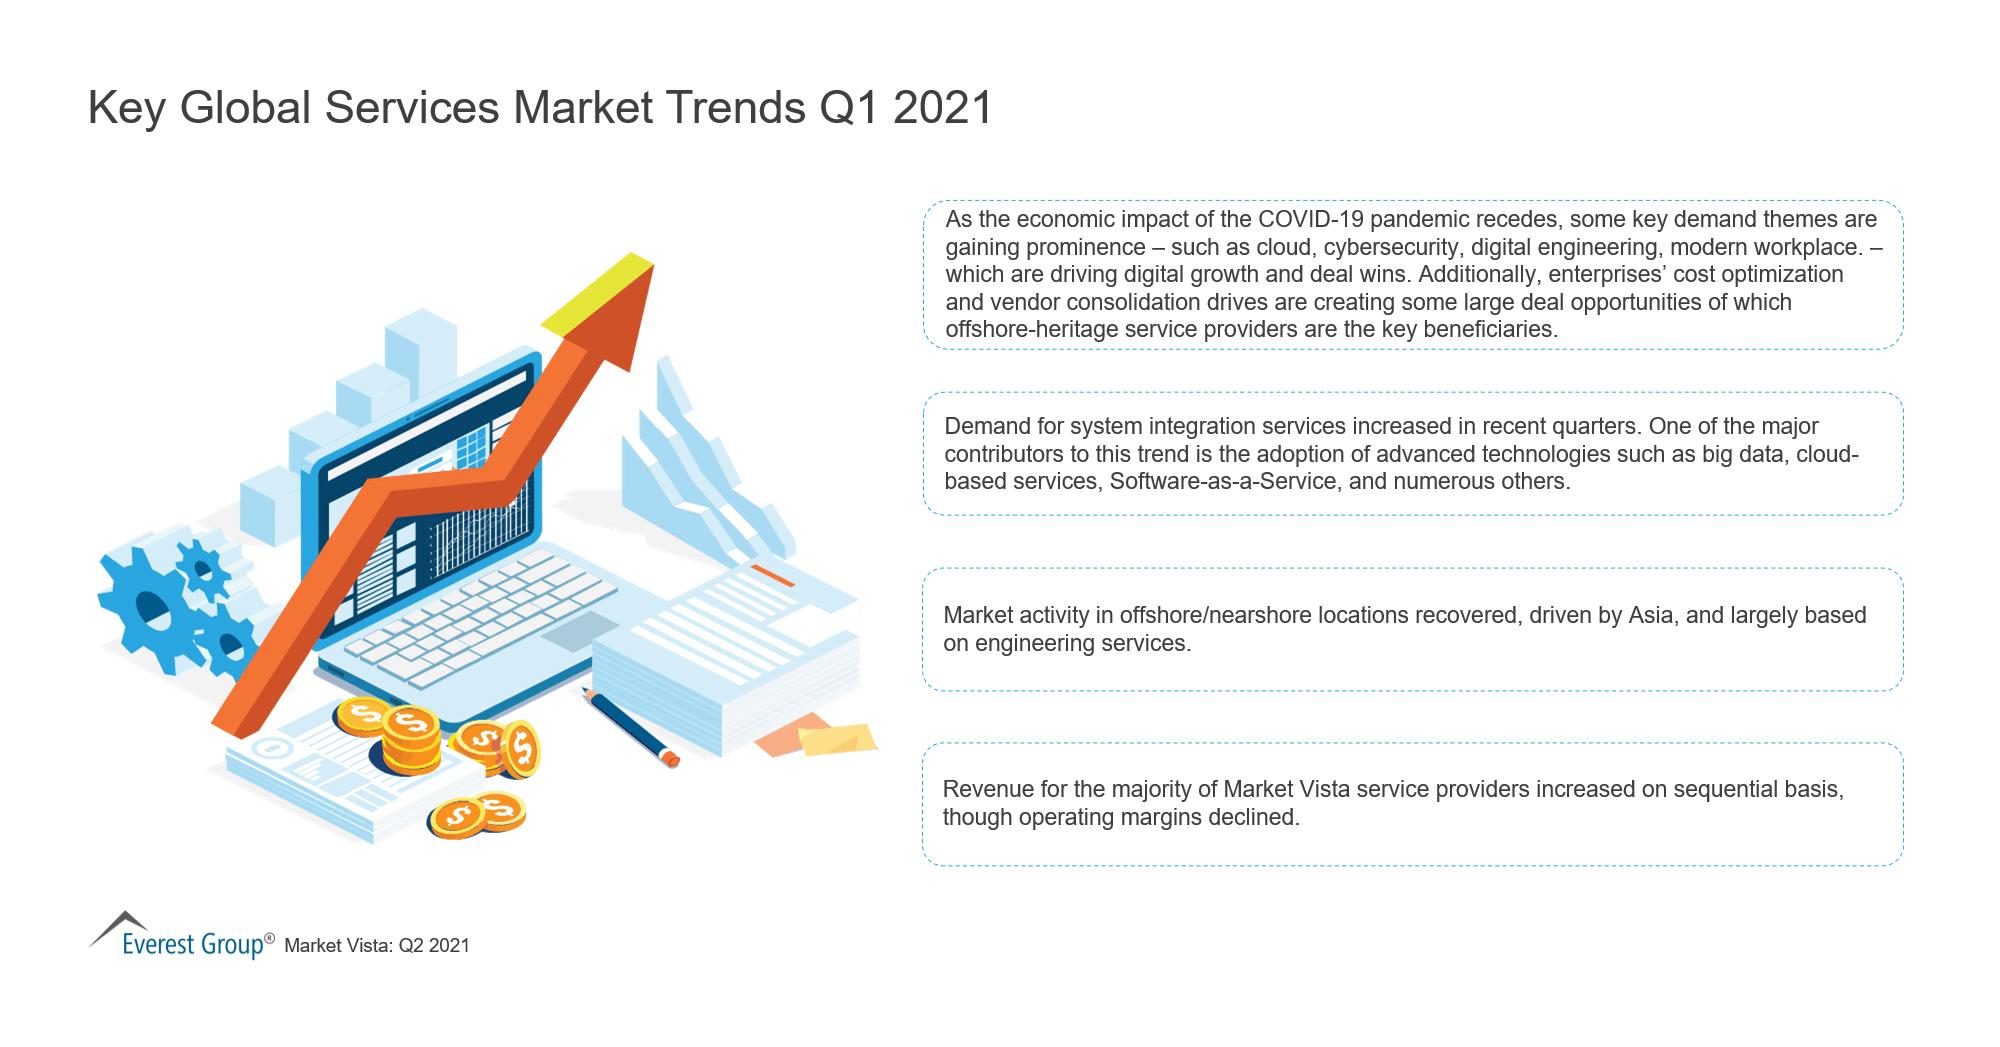 Market Vista Q2 2021 for PR